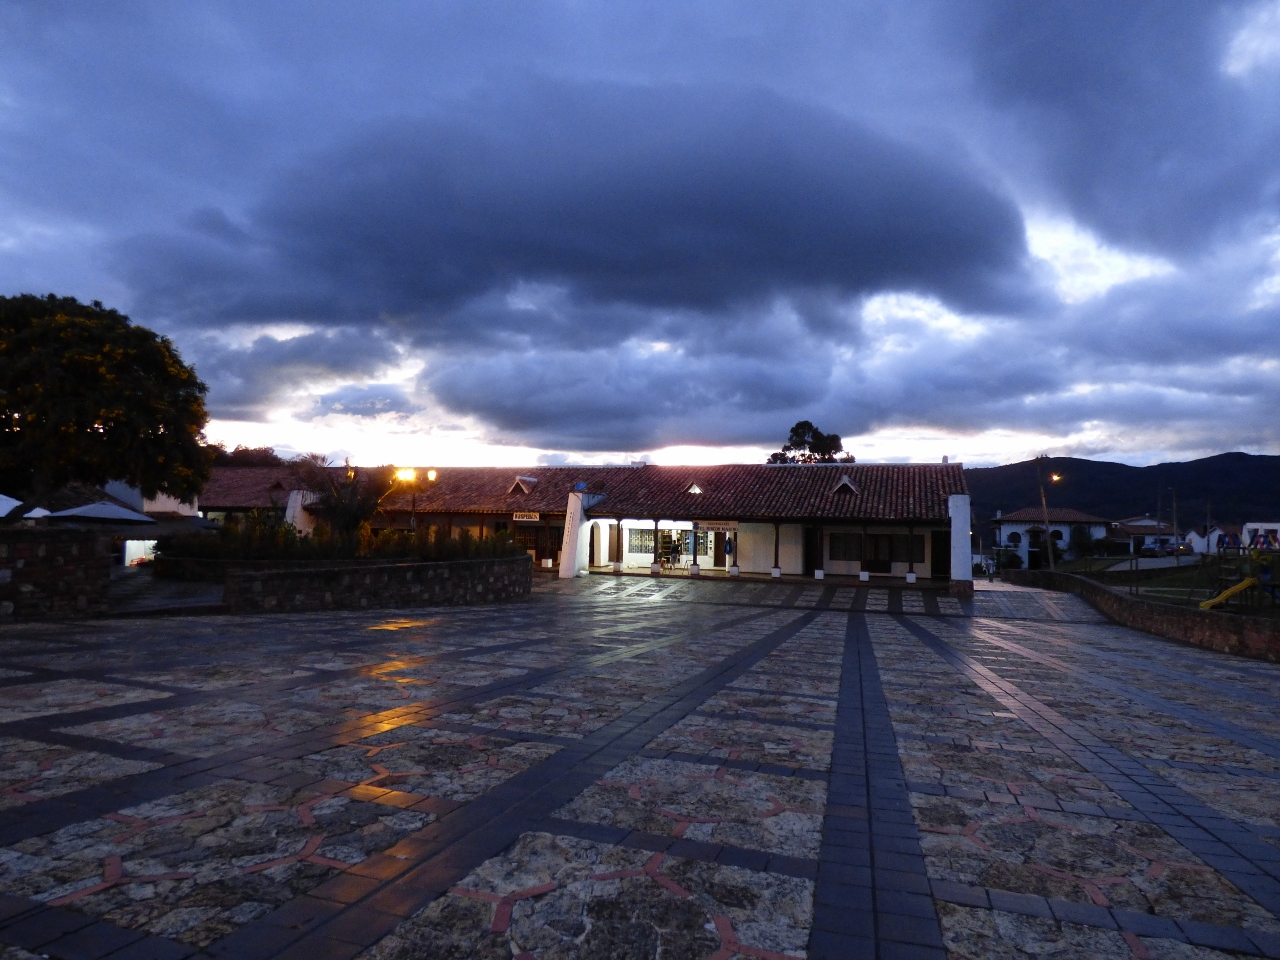 Plaza en Guatavita - Cundinamarca. Foto: David Medina